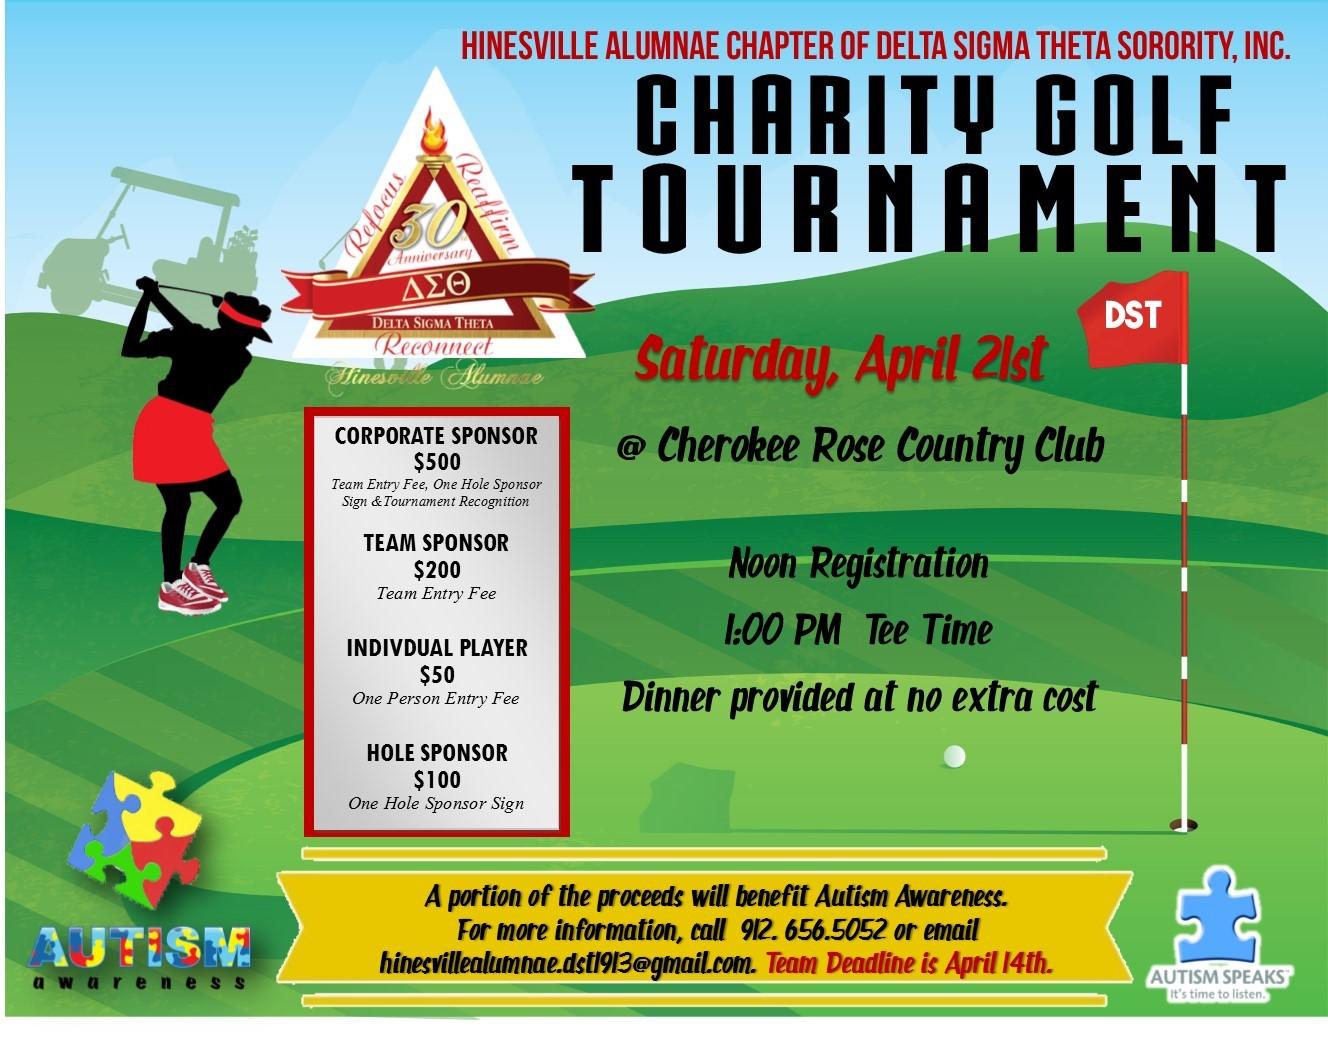 2018 charity golf tournamentliberty county georgia hospitality